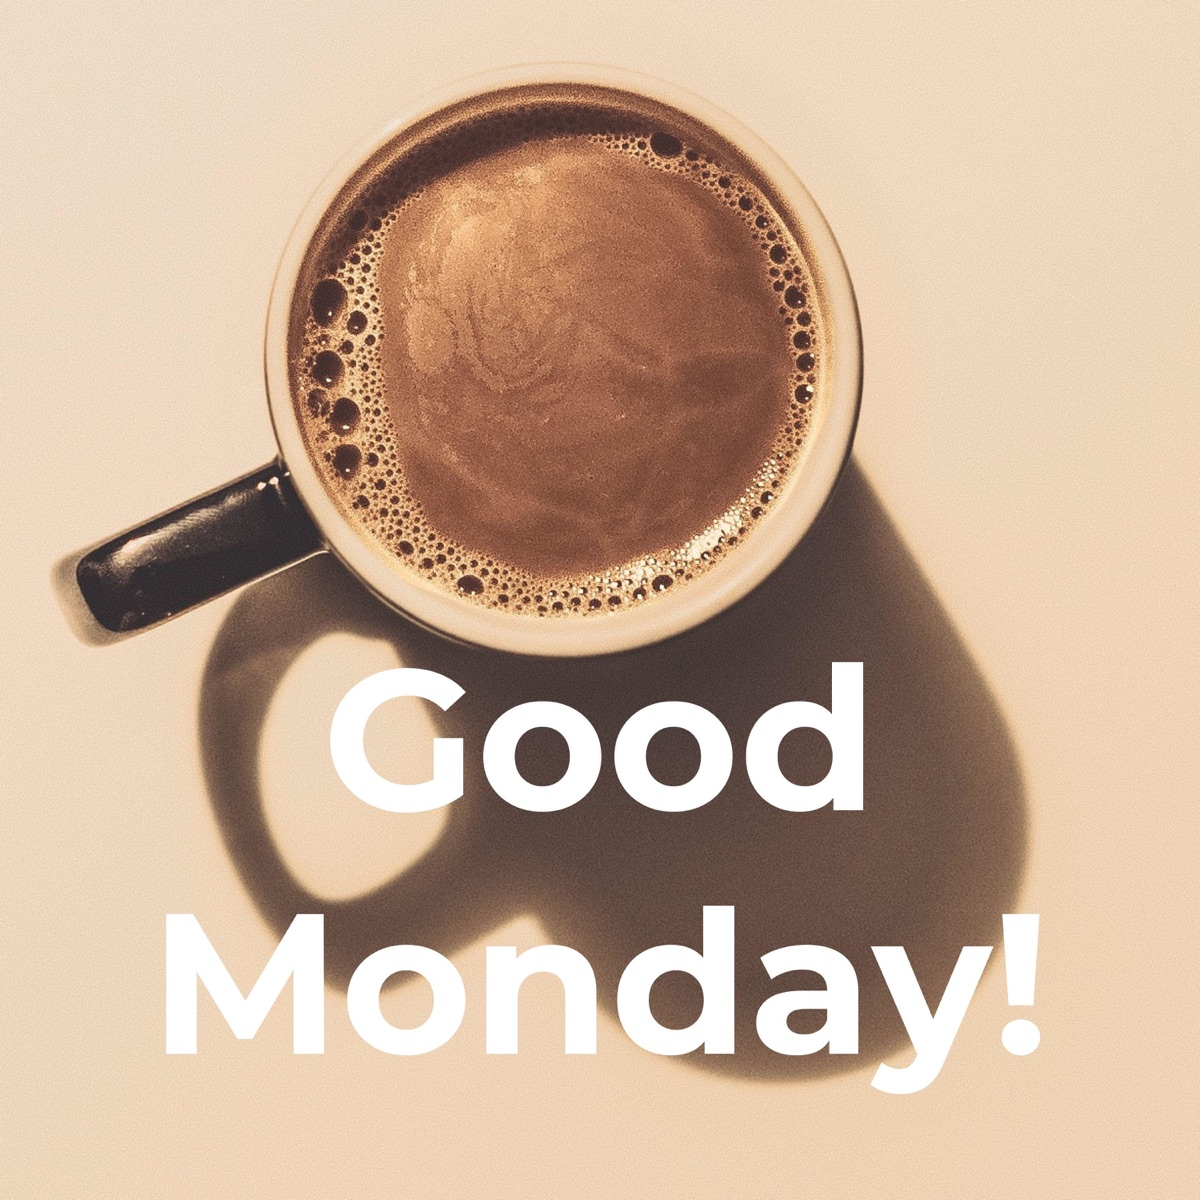 Good Monday!